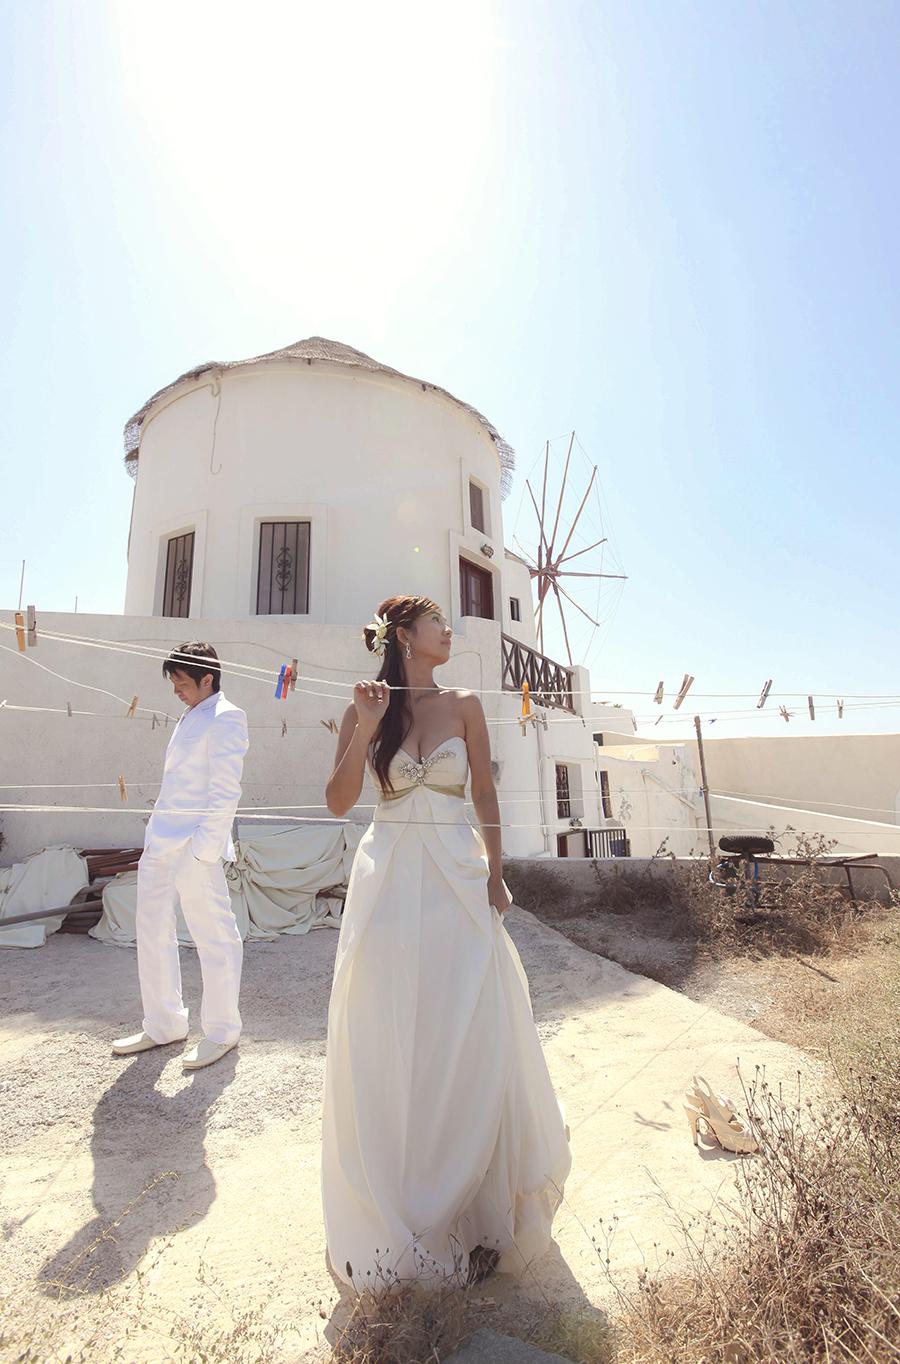 santorini greece . wedding photography by kurt ahs . 3058.jpg